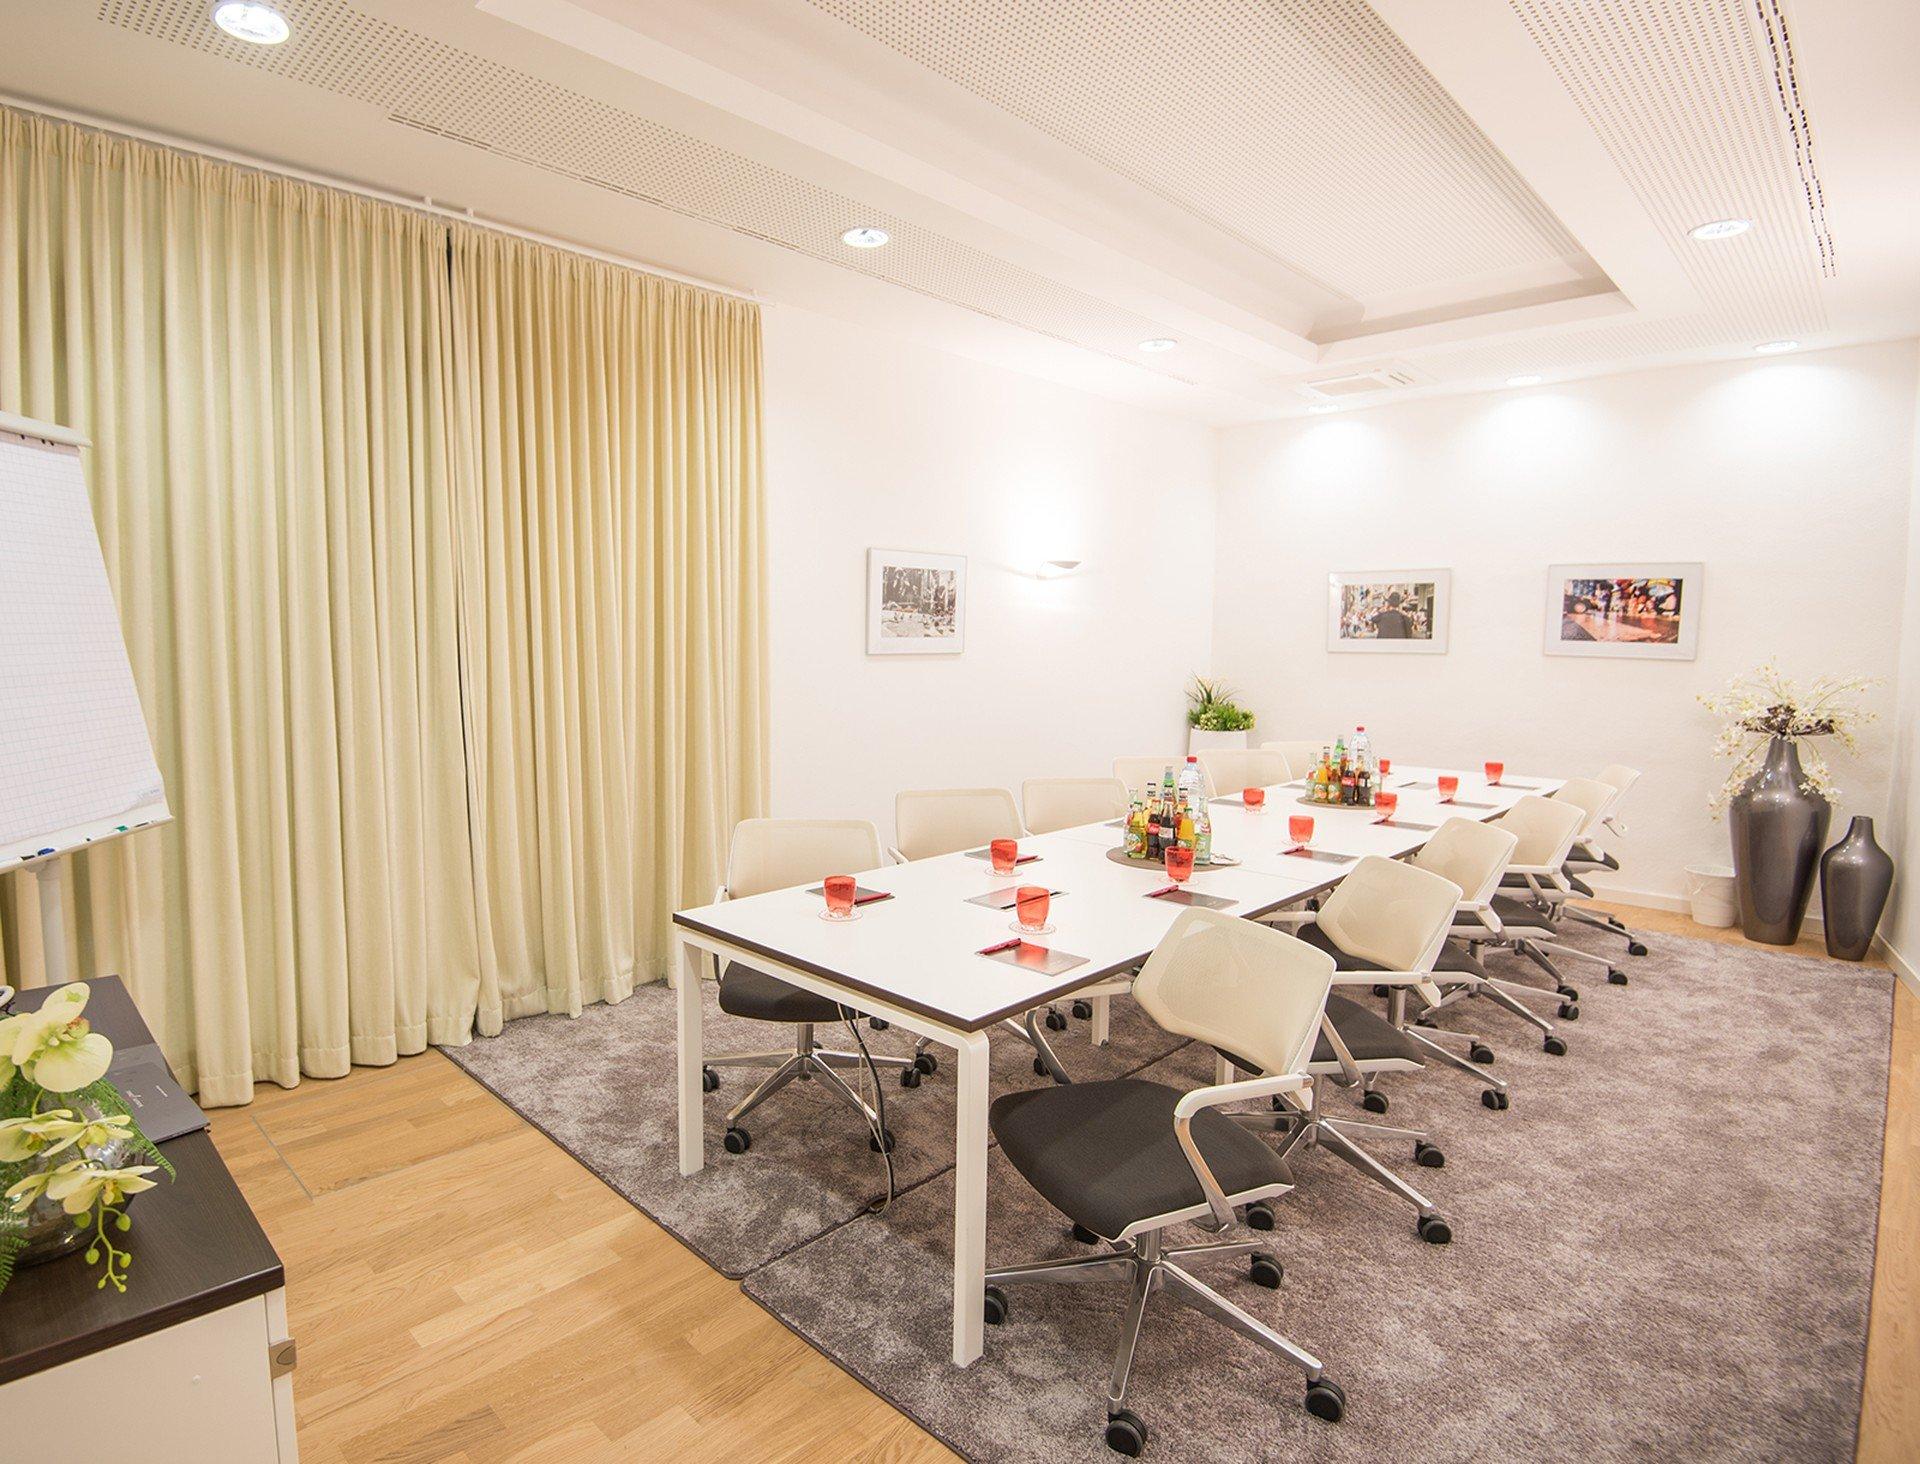 Munich Besprechungsräume Meeting room Satellite Office - Alte Hopfenpost - Stachus image 1